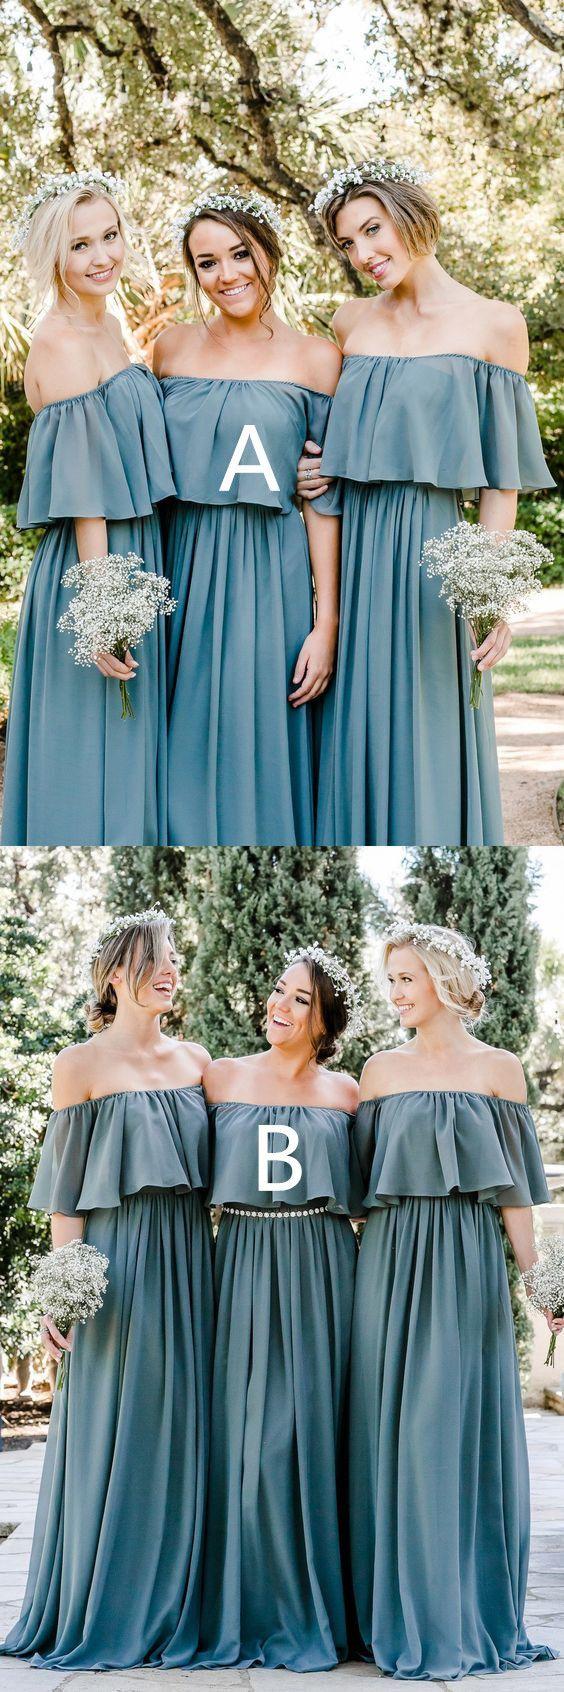 Off the shoulder bridesmaid dresses ruffled bridesmaid dresses